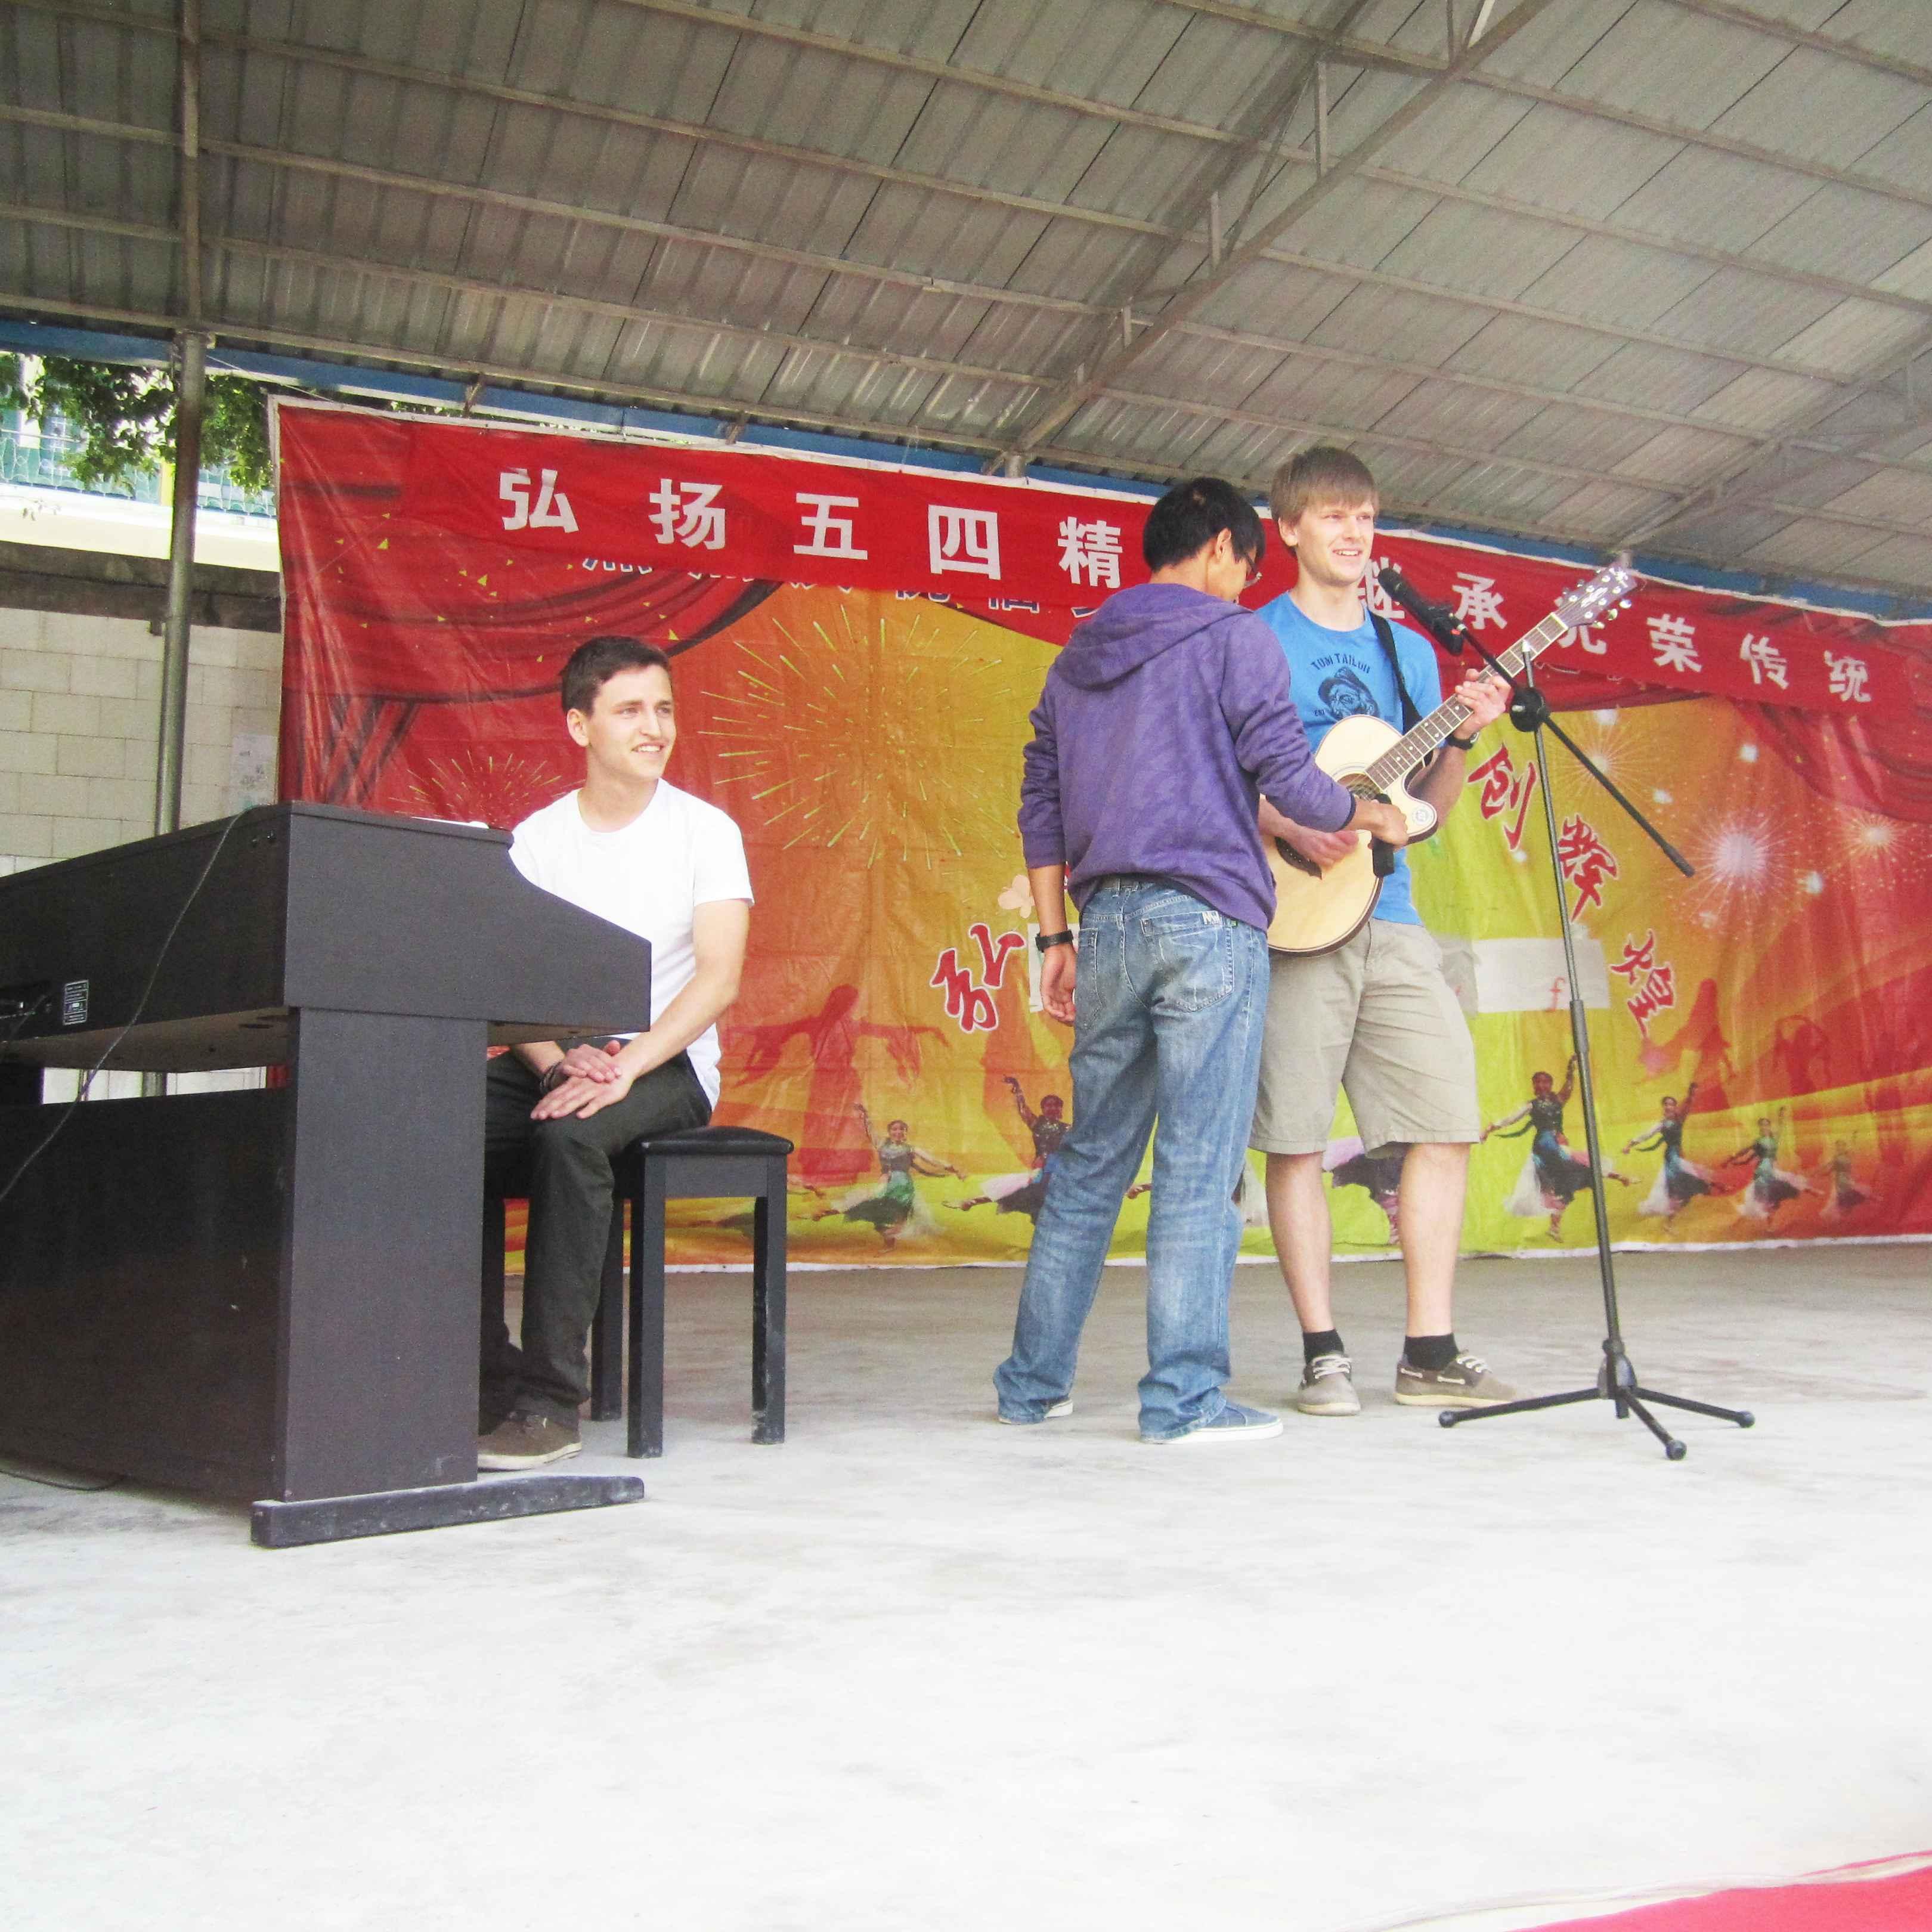 Freiwilligendienst in China, FSJ in China